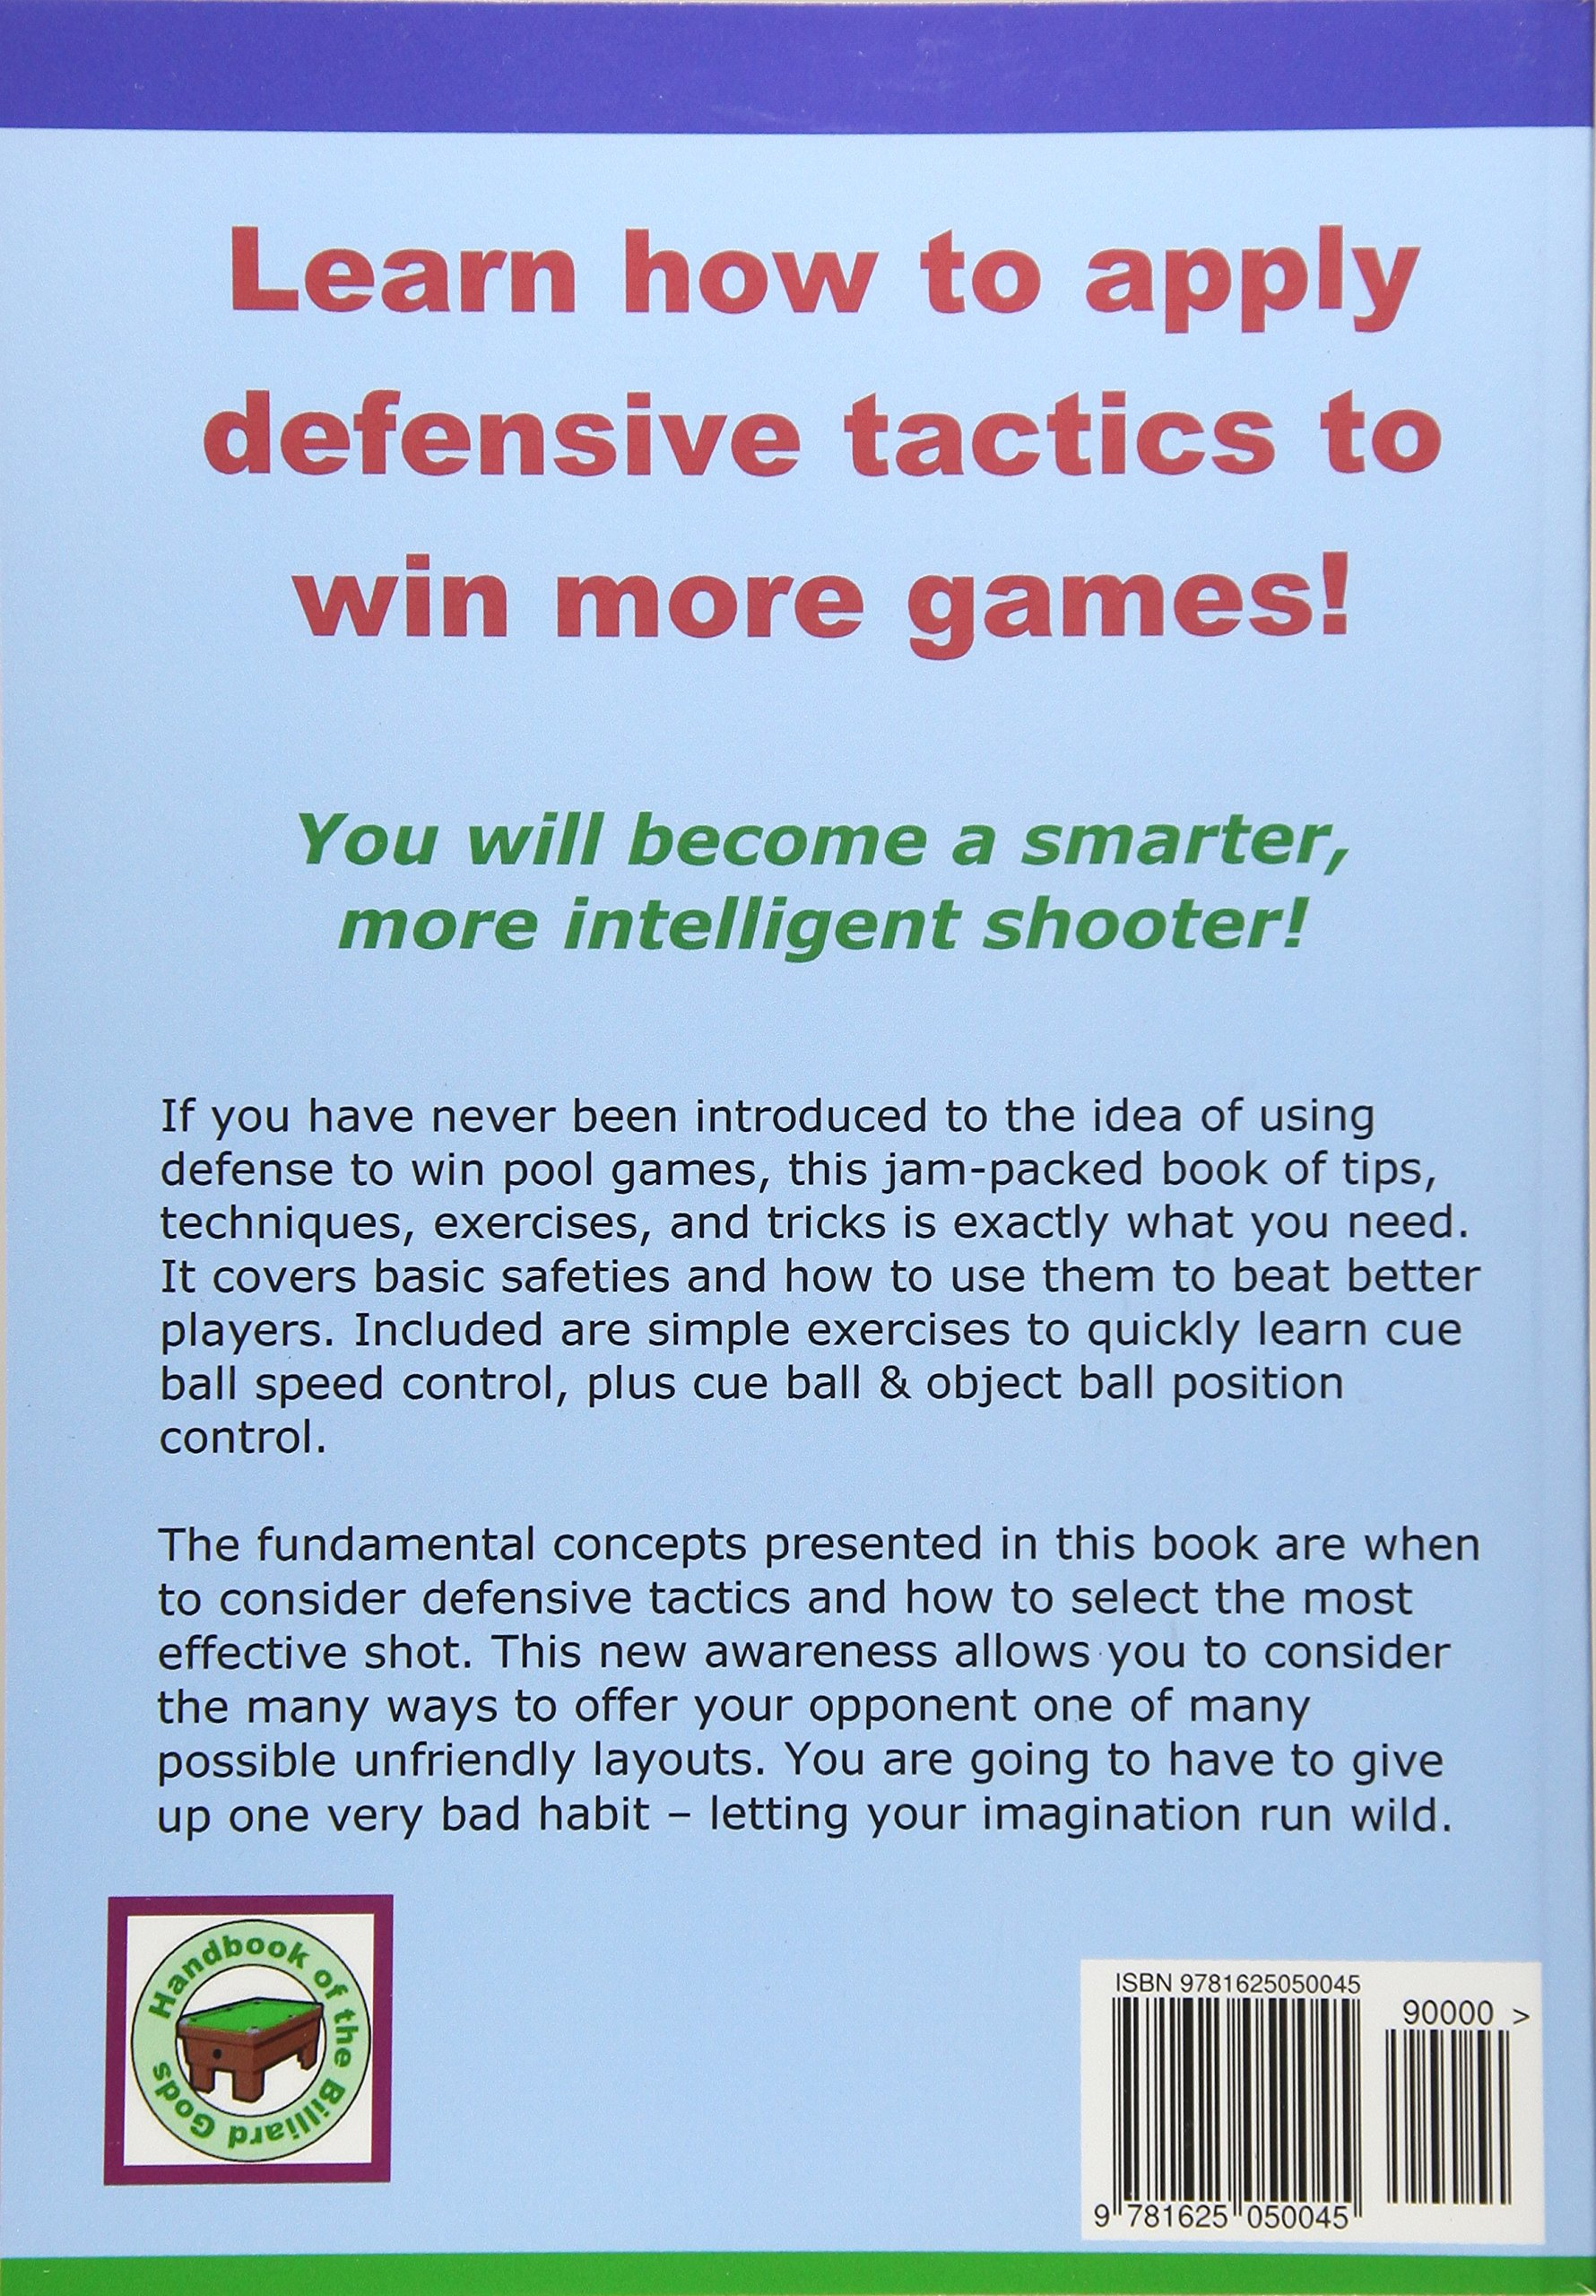 Basic Defense & Safety Fundamentals for Pool & Pocket Billiards ...